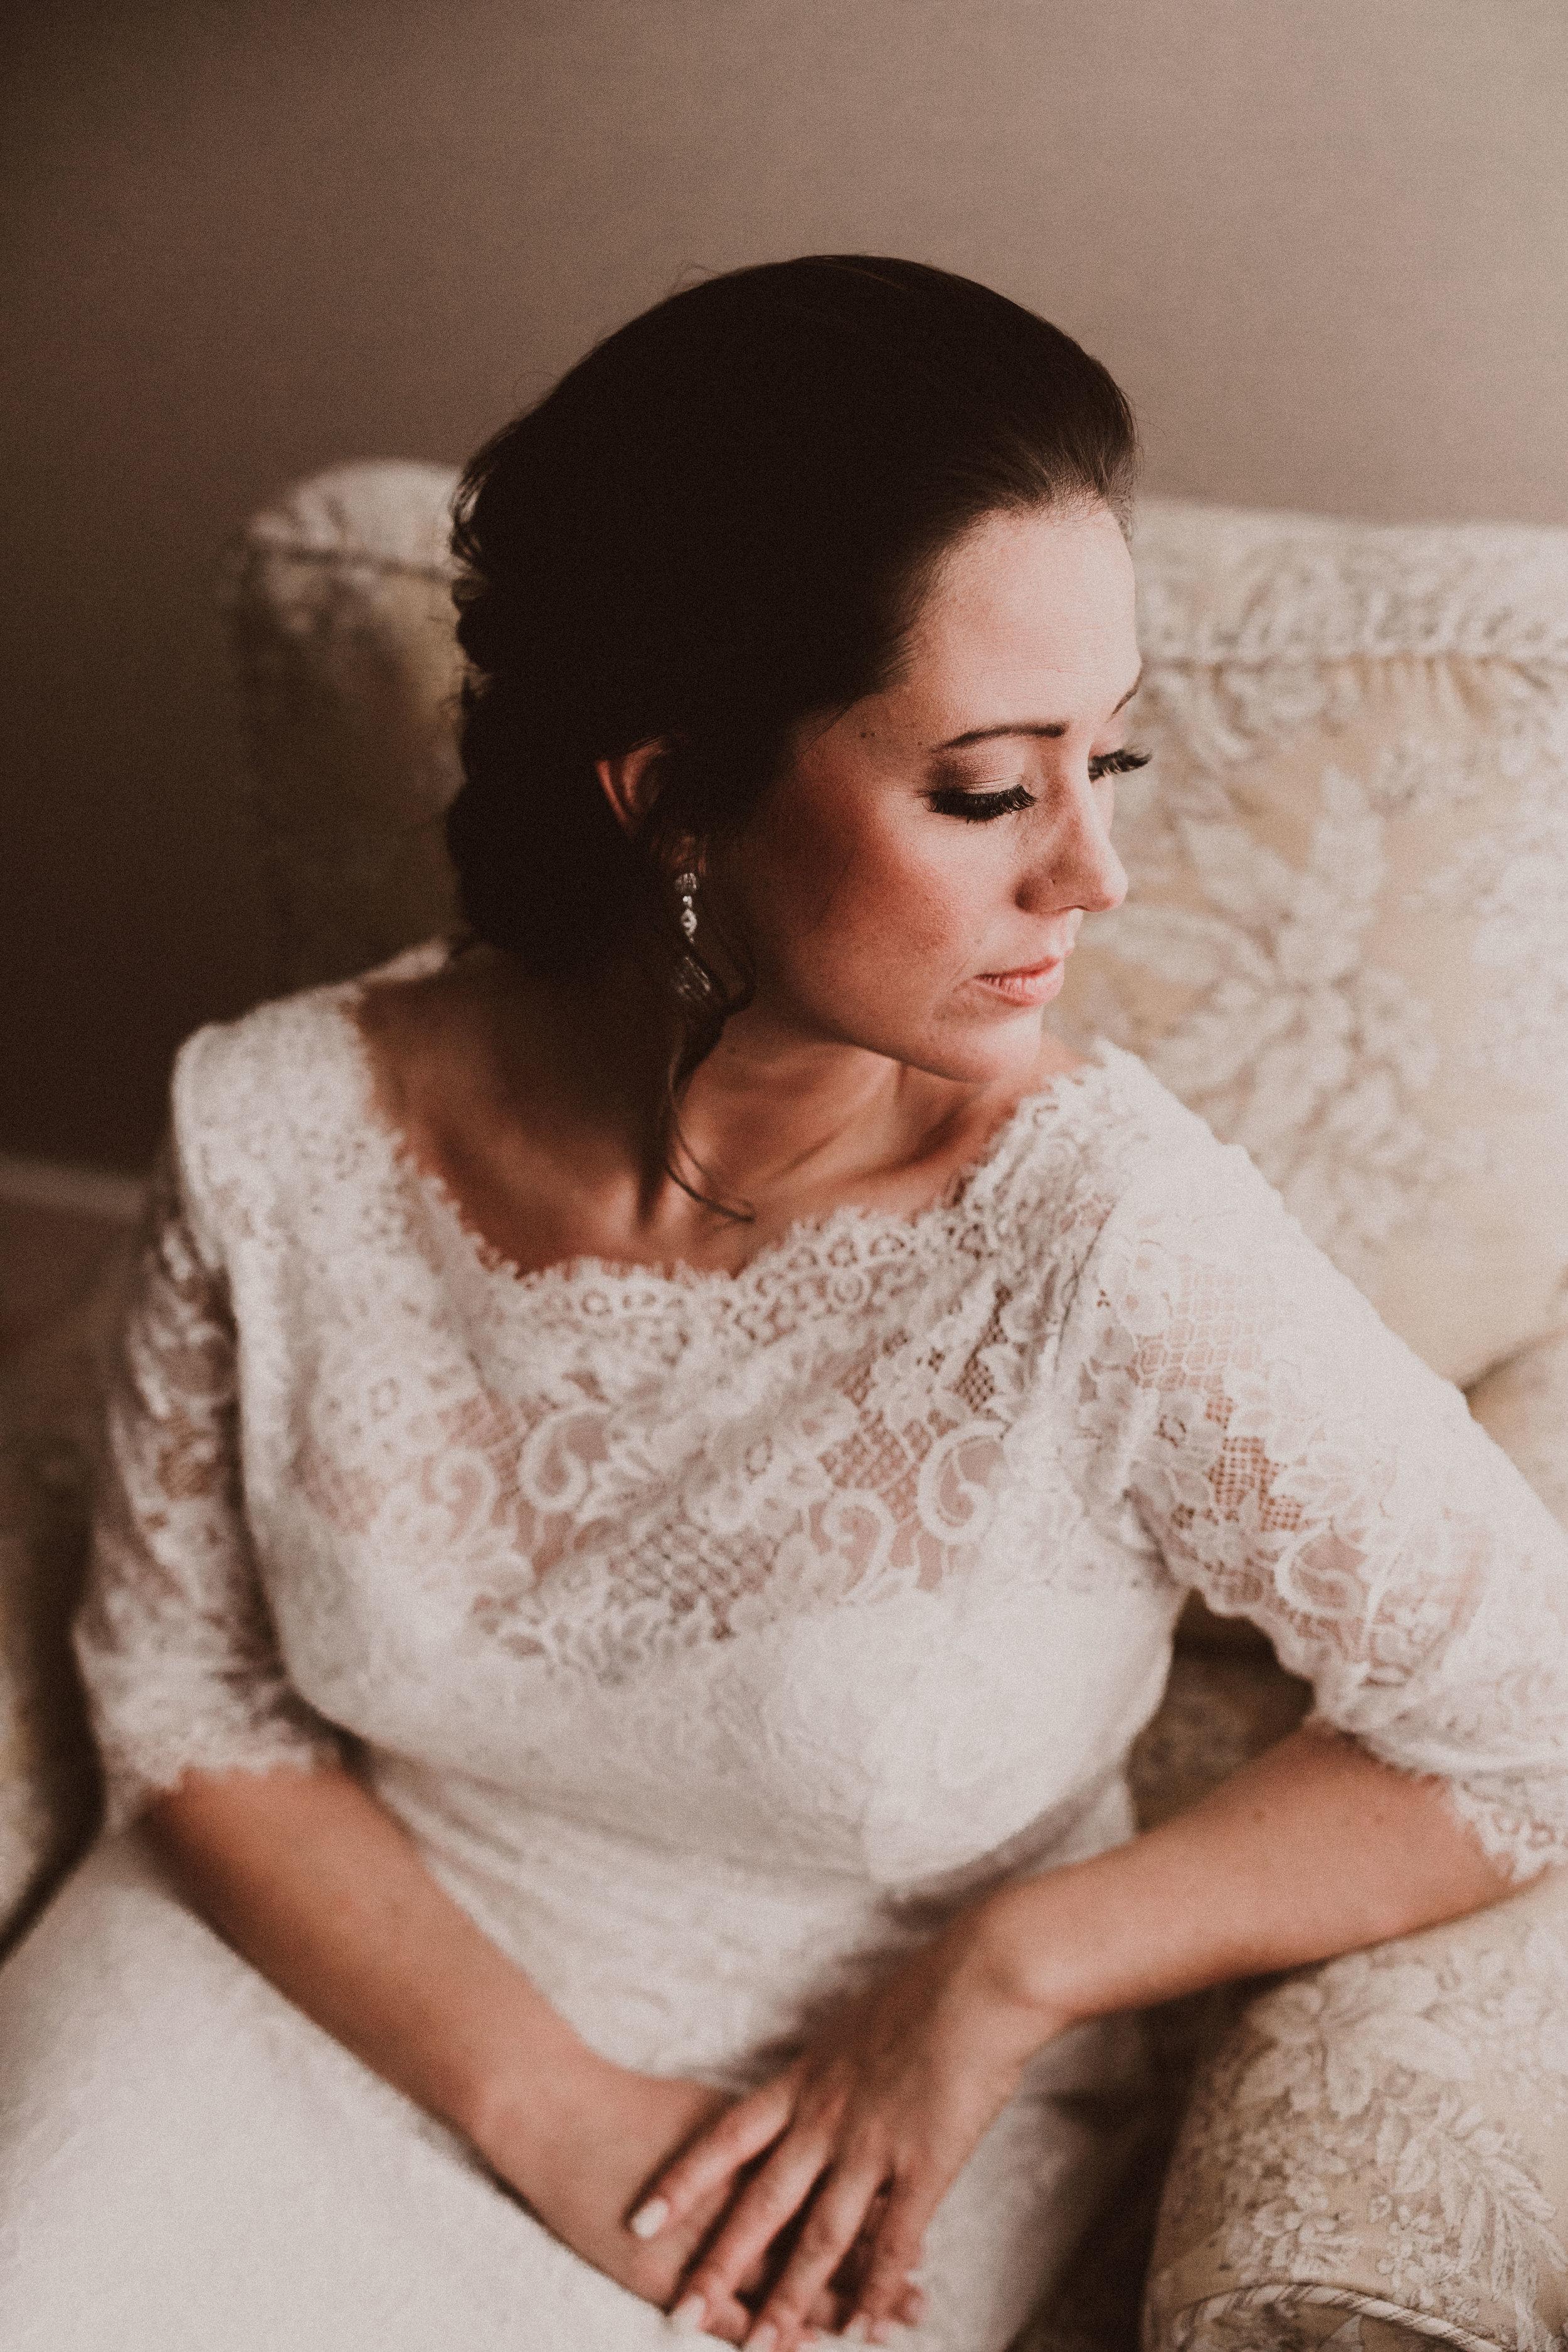 BUTLER, PA WEDDING PHOTOGRAPHER - 5W7A6956.jpg